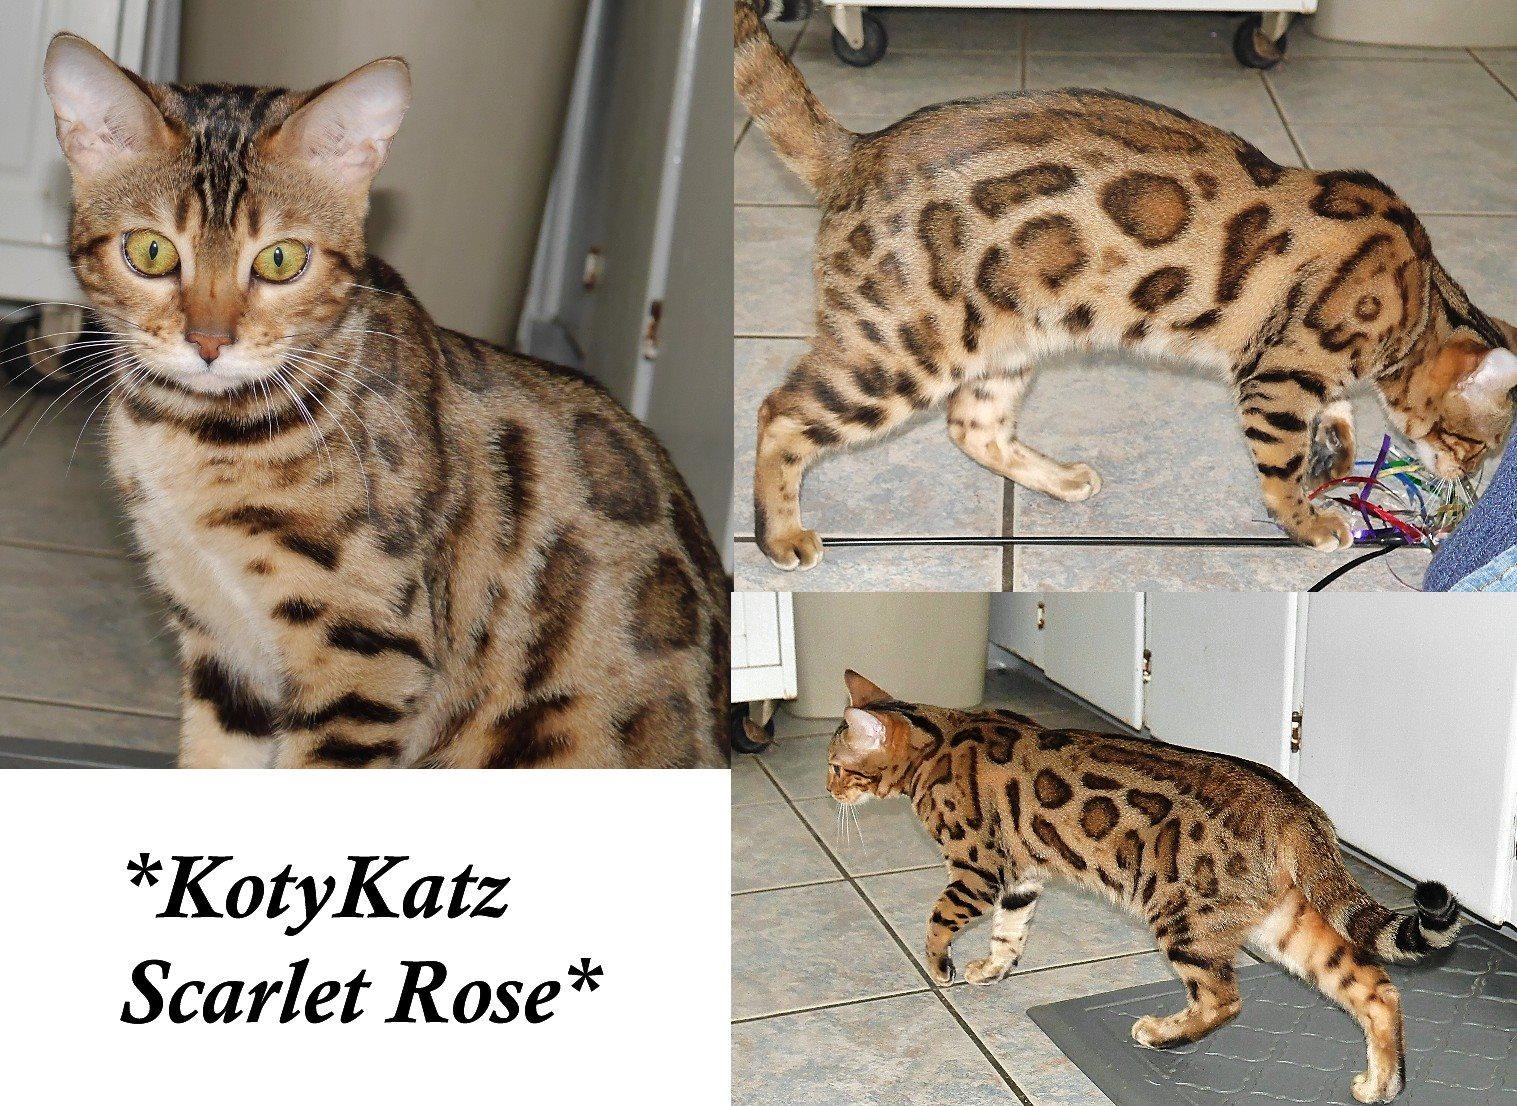 KotyKatz Scarlet Rose